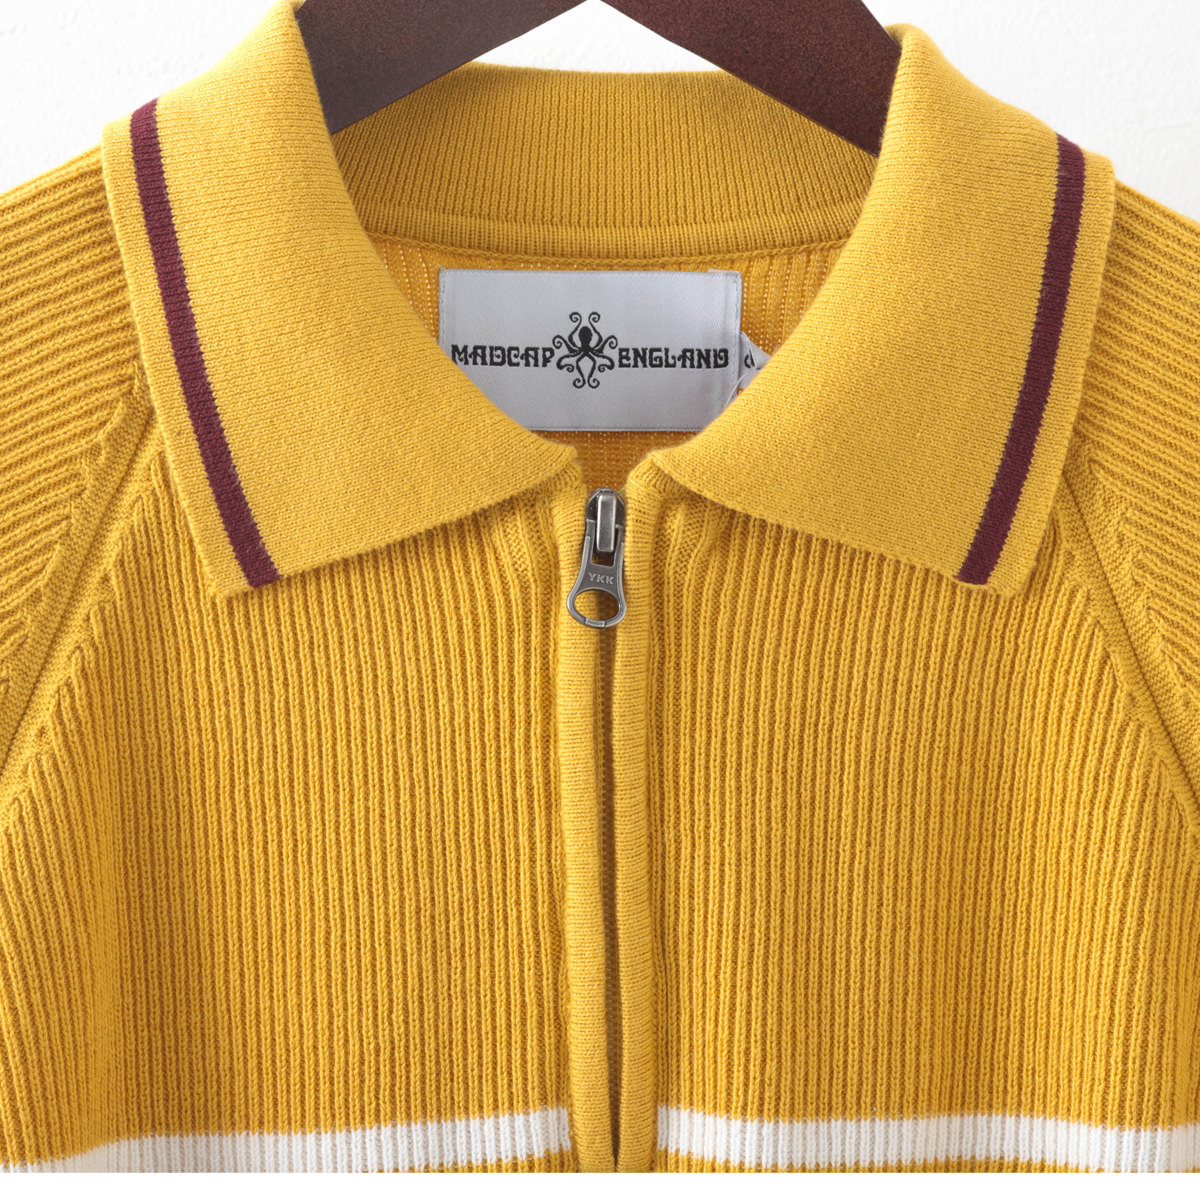 Madcap England マッドキャップ メンズ ポロシャツ 半袖カーディガン ジップスルー ストライプ コットン